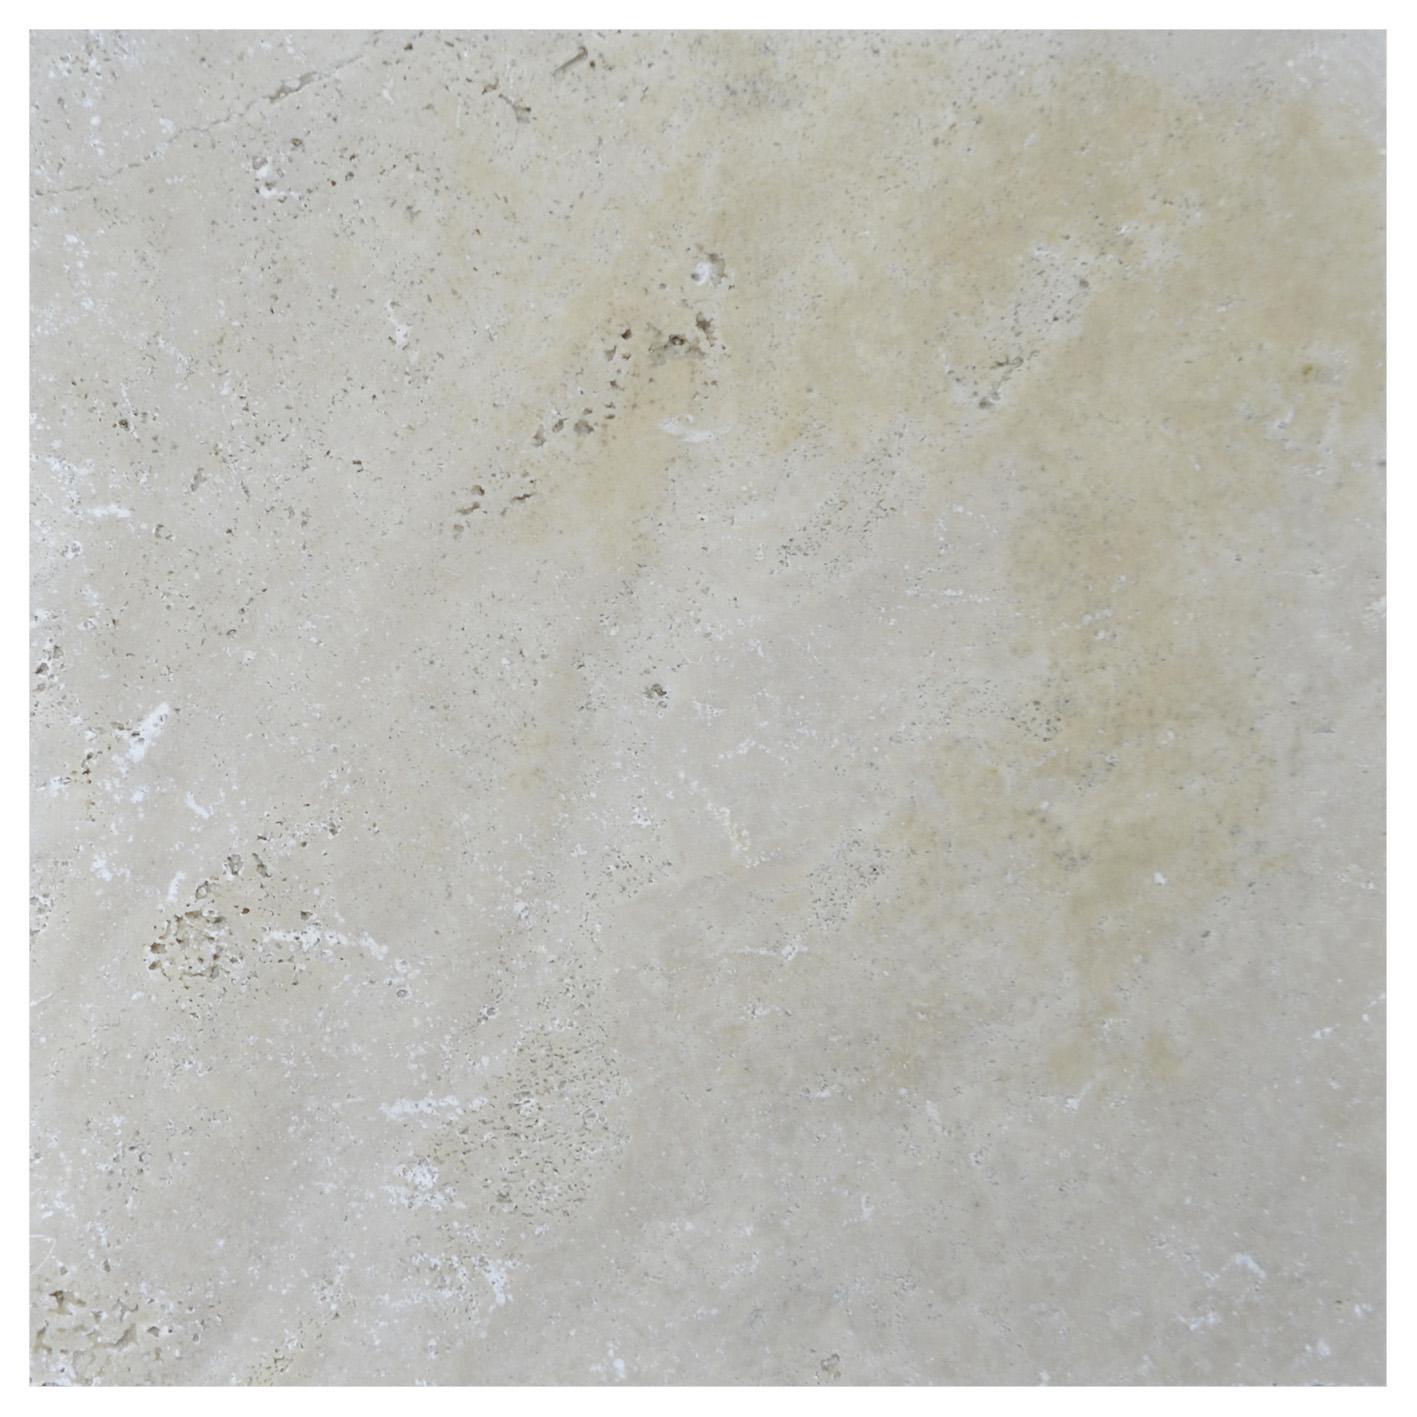 Toscana Tumbled Travertine Paver 12x12-pavers sale-Atlantic Stone Source